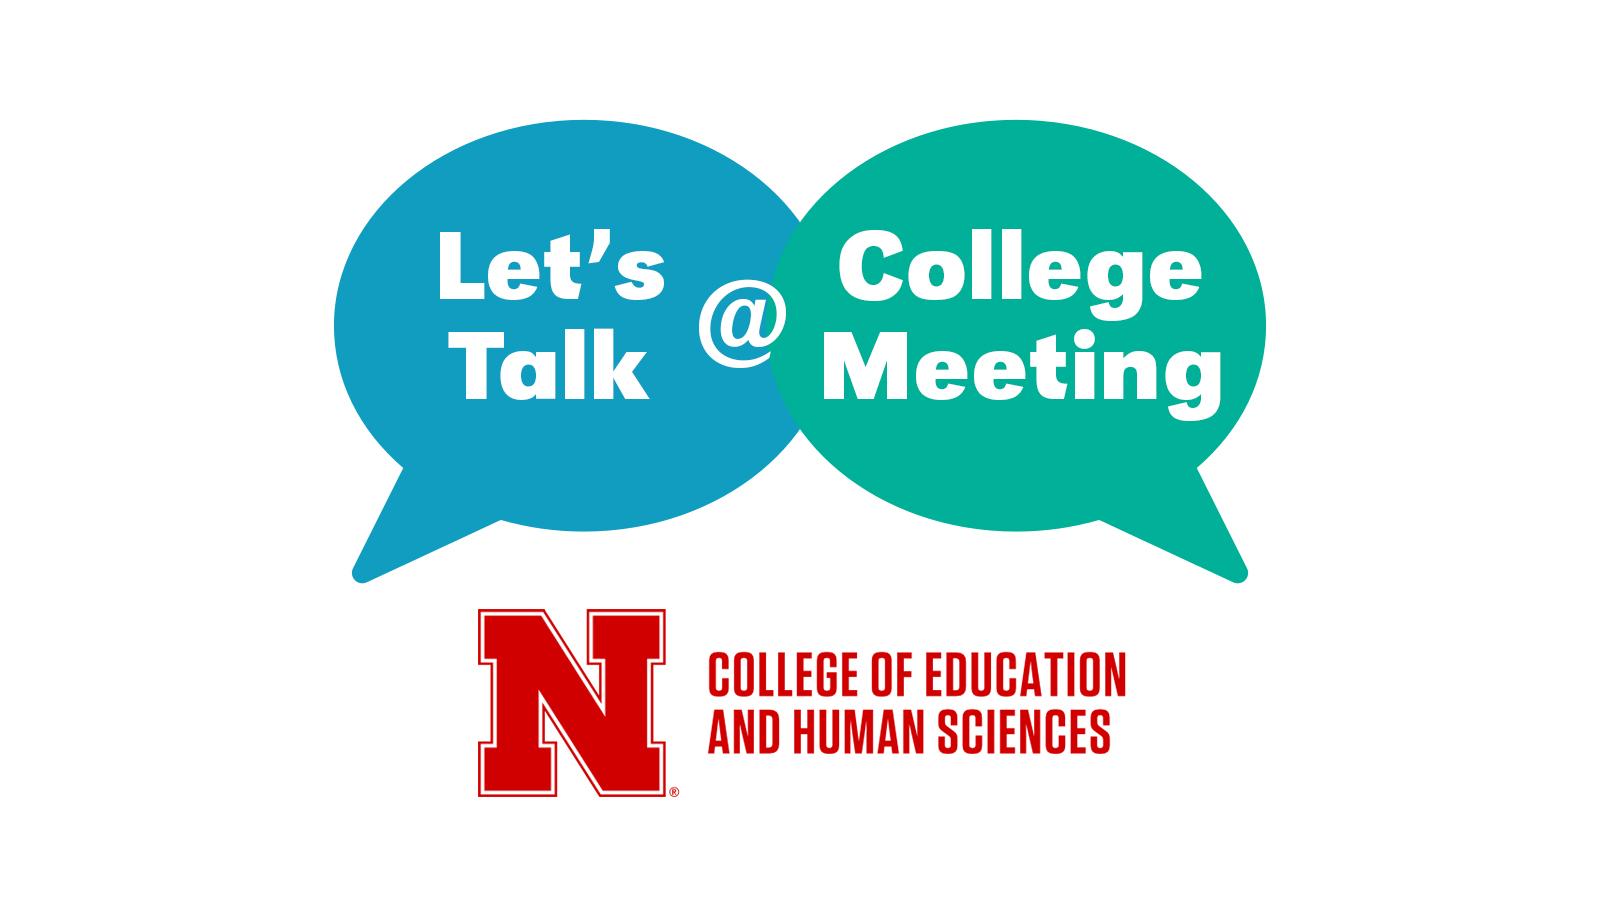 College meeting Feb. 9, 2018.